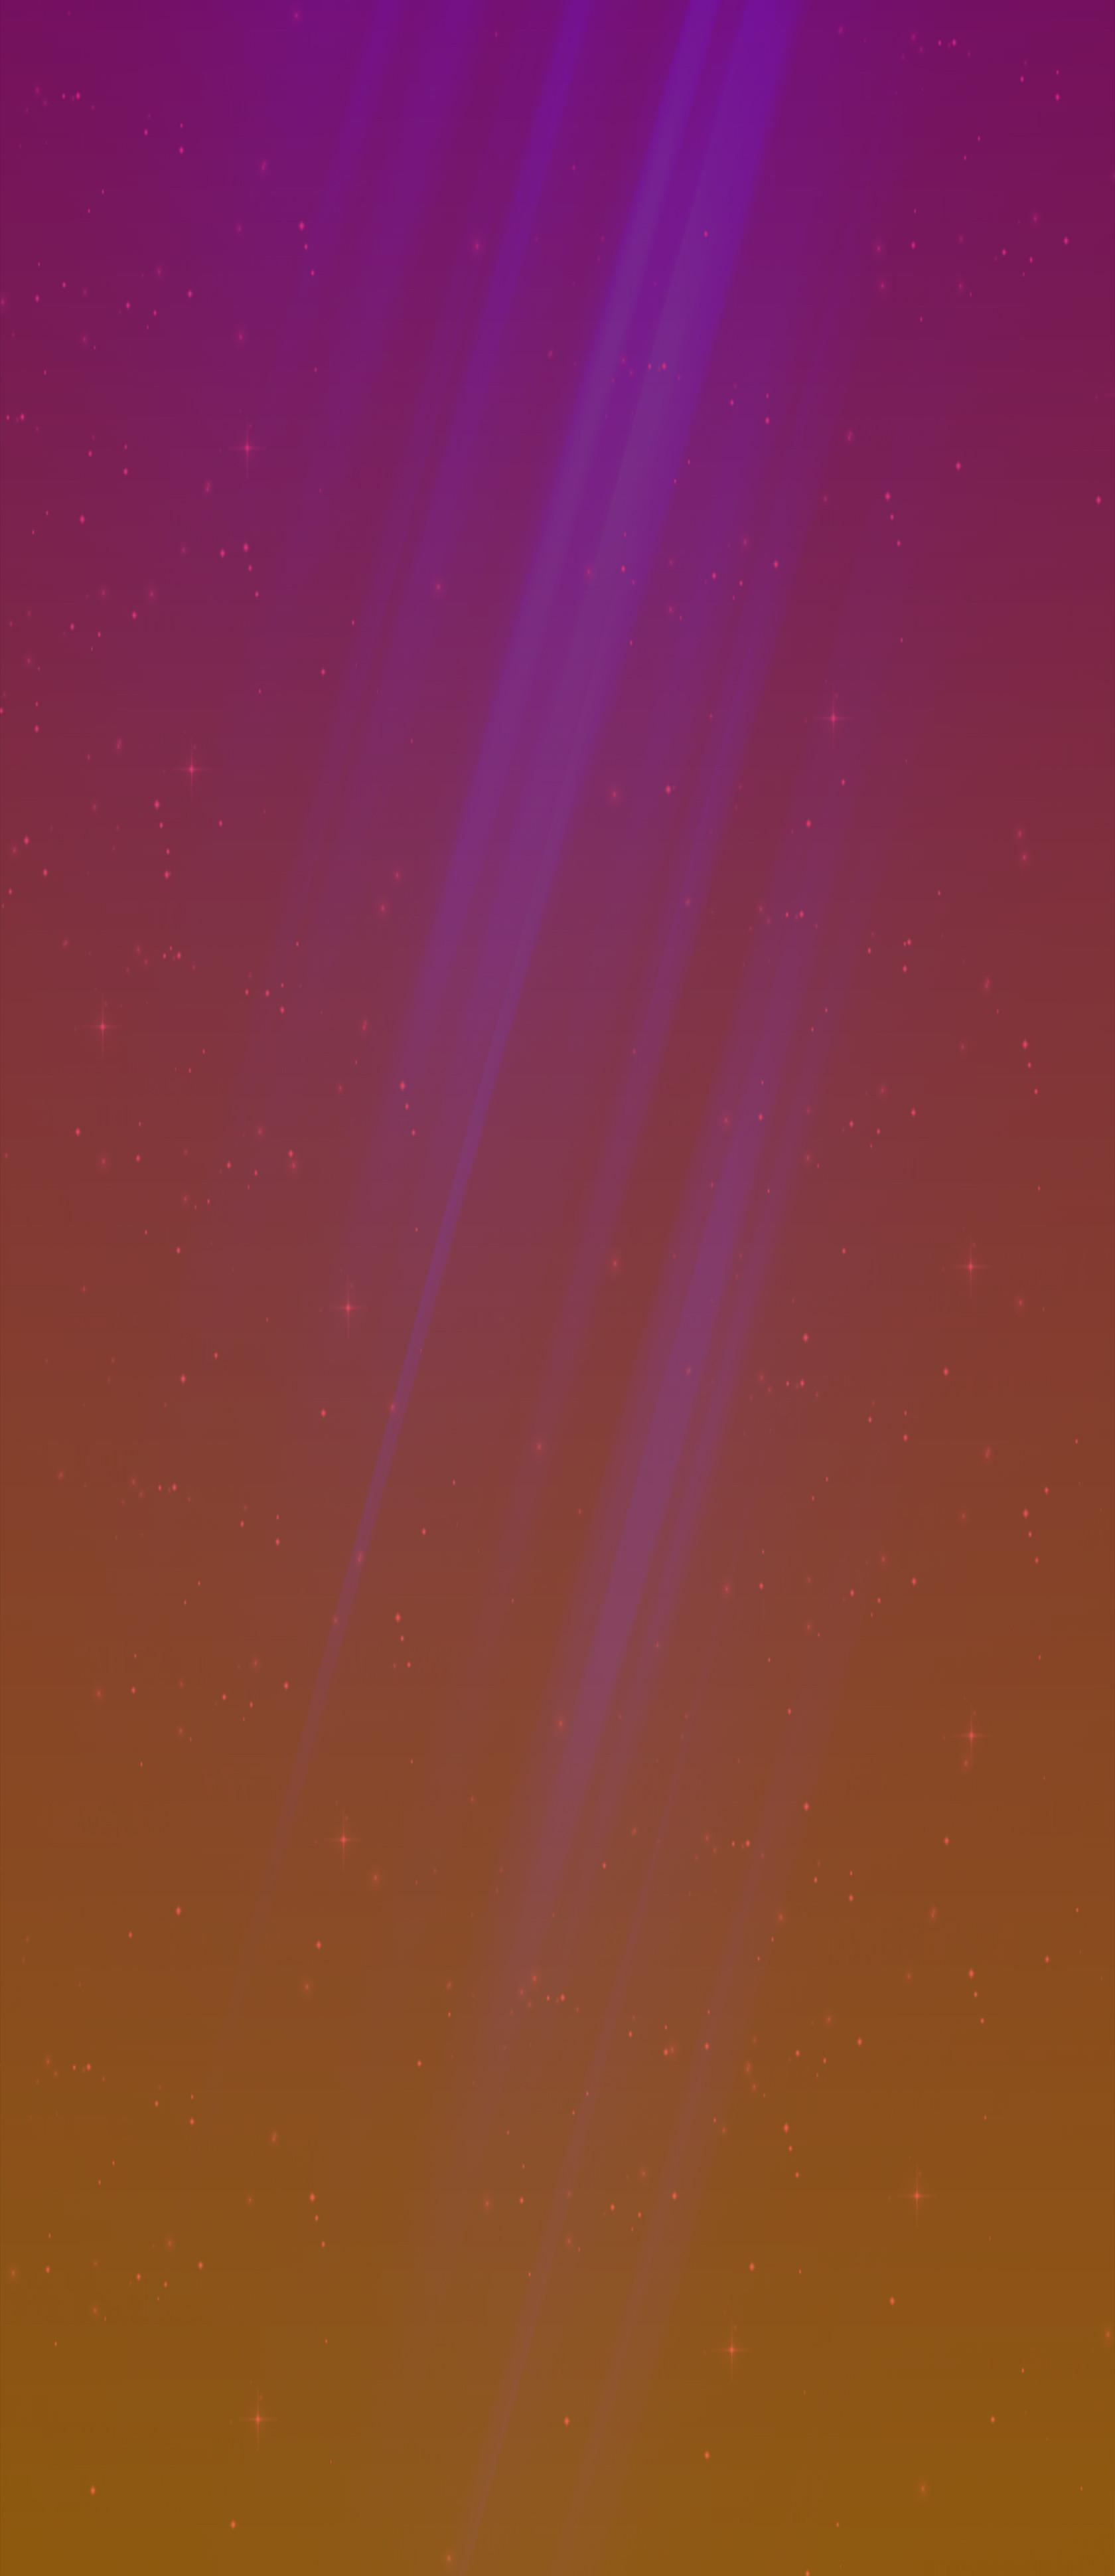 The Phoenix Rises - Strip 4.jpg